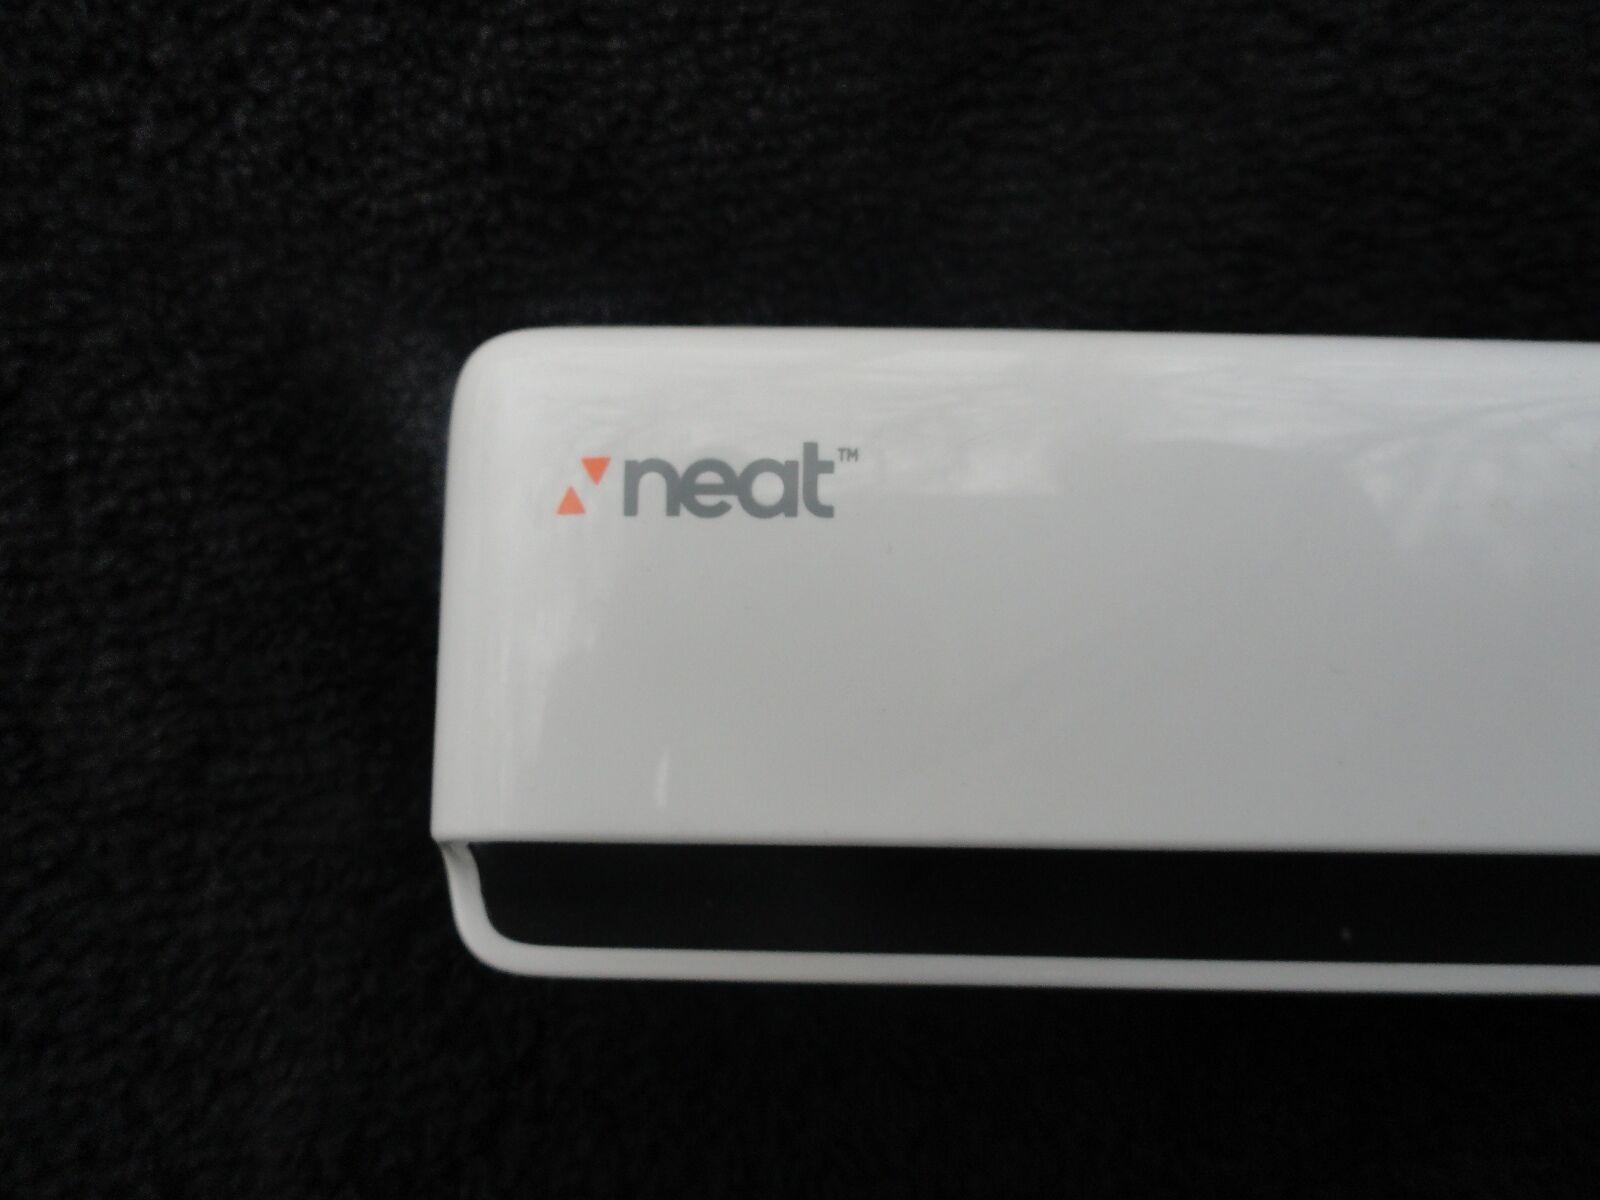 Neat Receipts NR-030108 Business Card Scanner | eBay